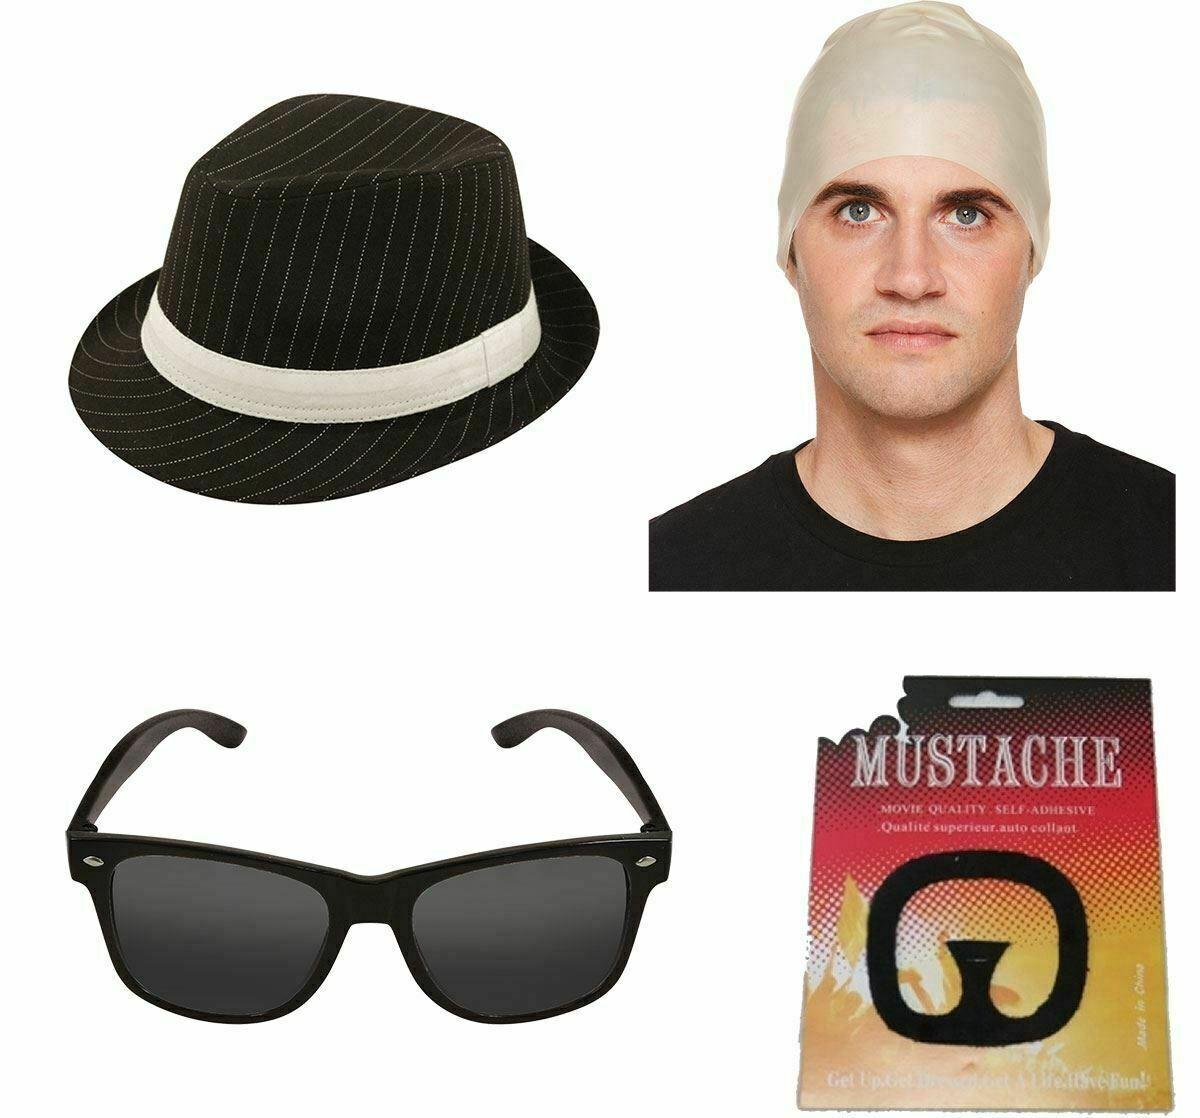 Mens Breaking Bad Gangster Hat Moustache Glasses And Bald Cap Accessory 4Pcs Set